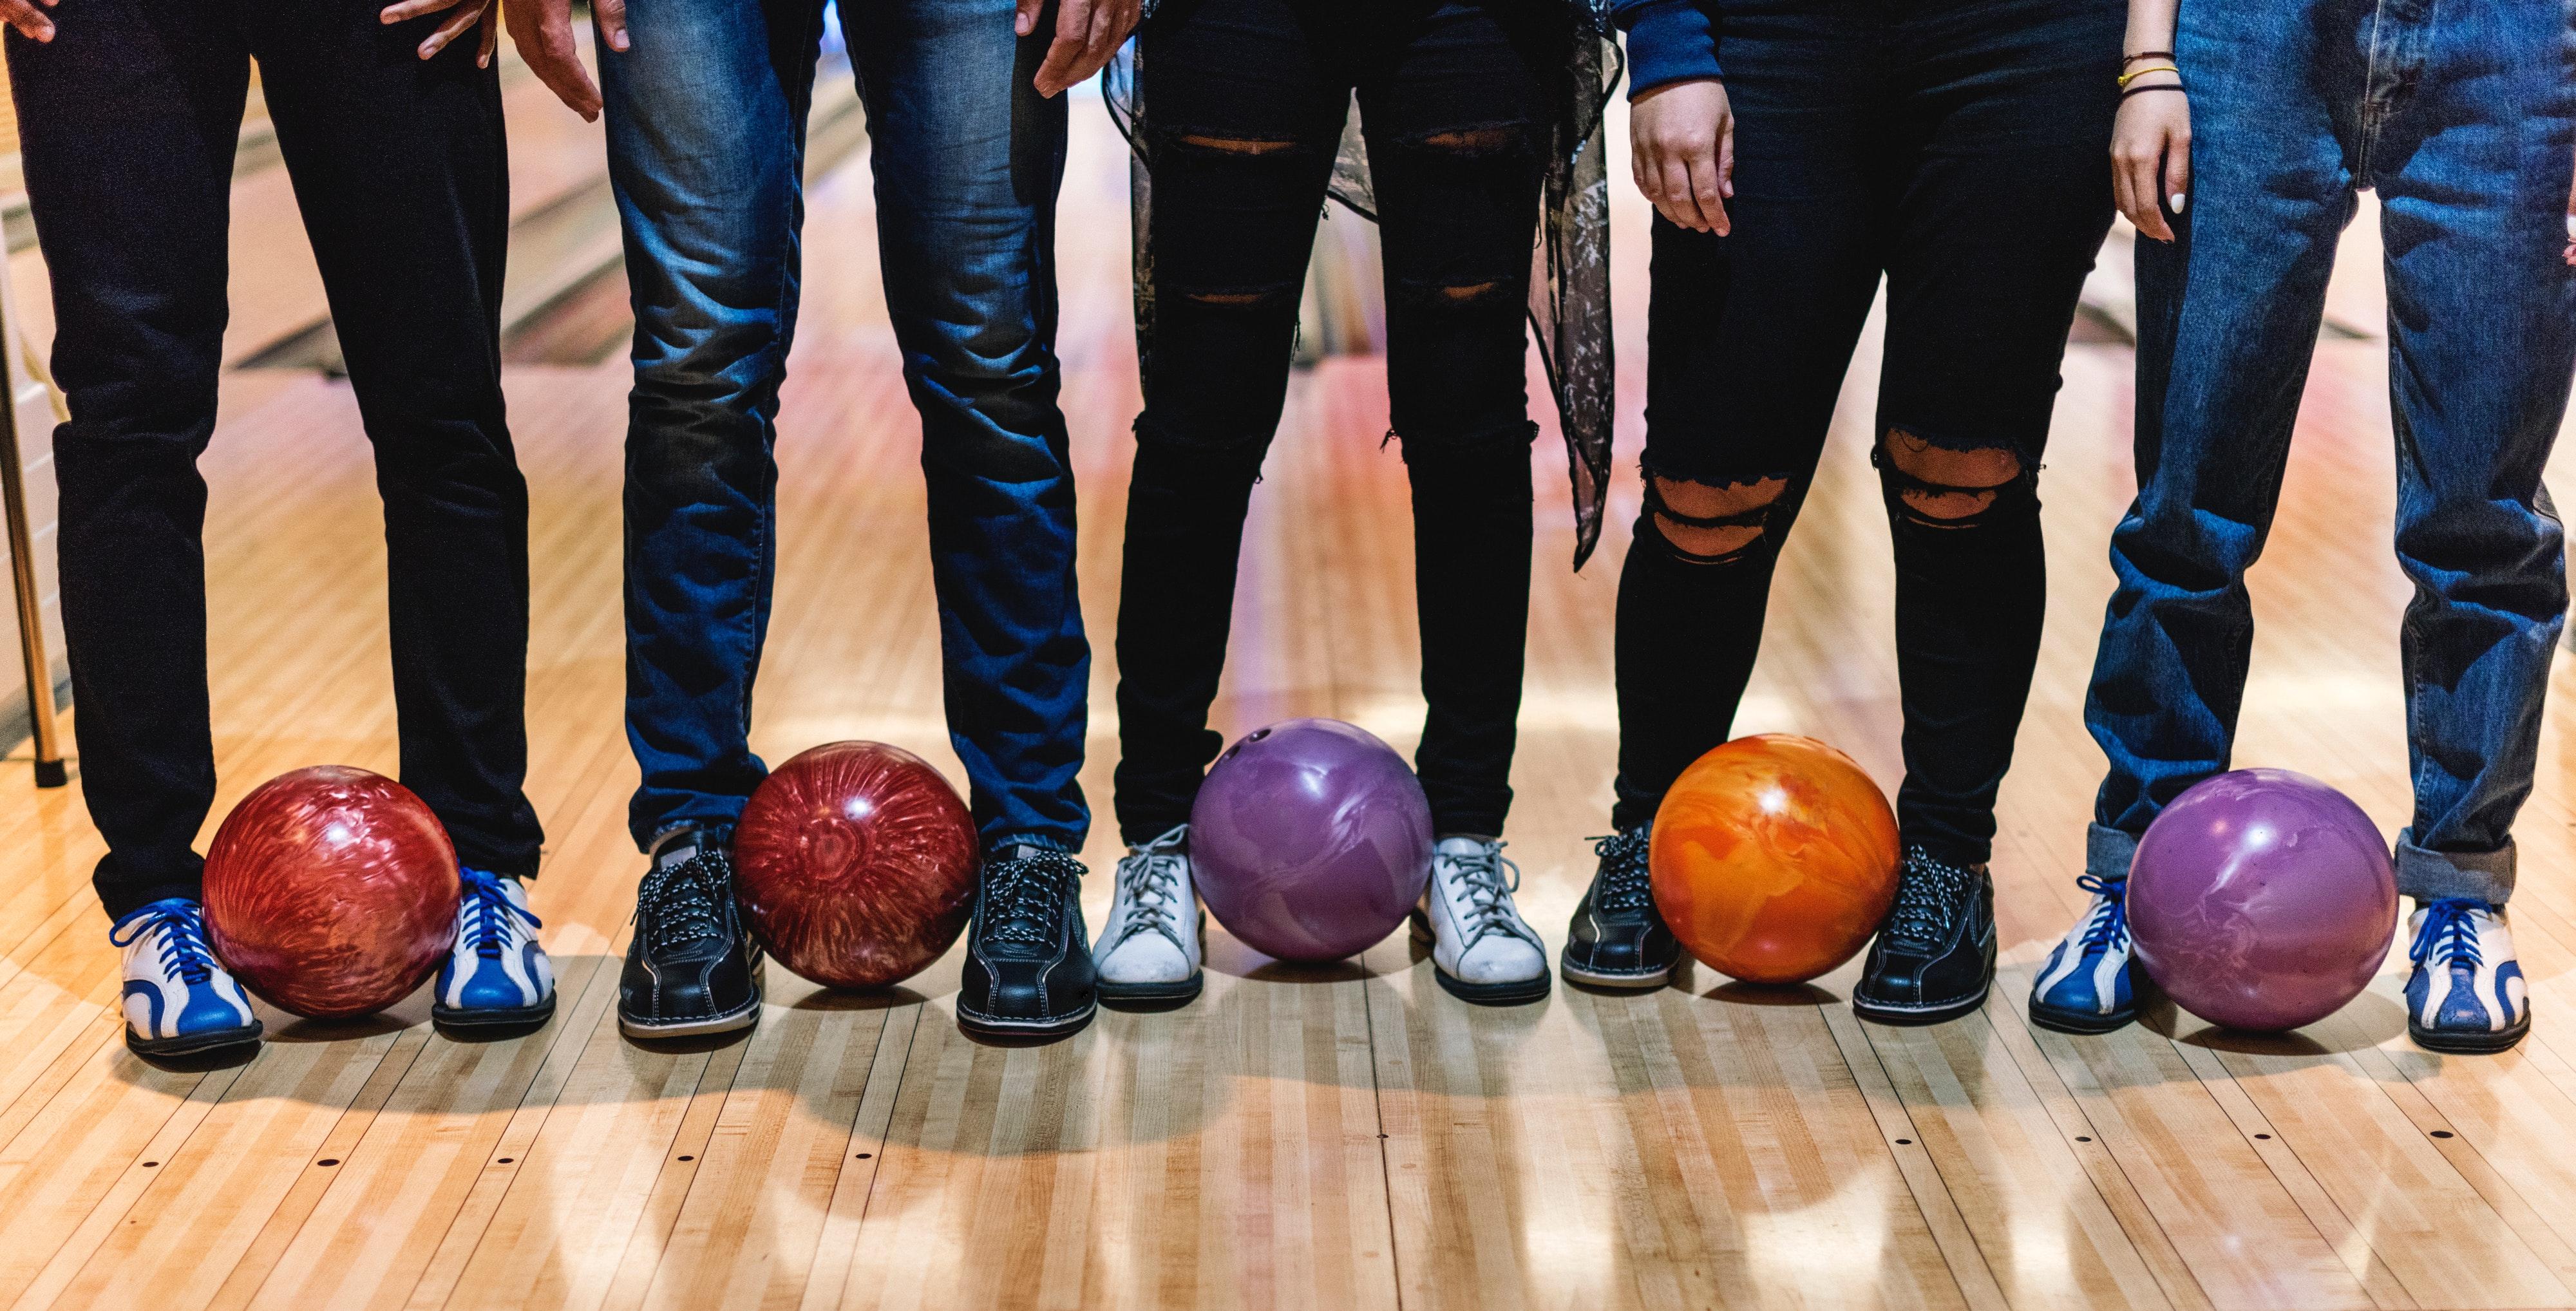 Bowl For Kids' Mentoring